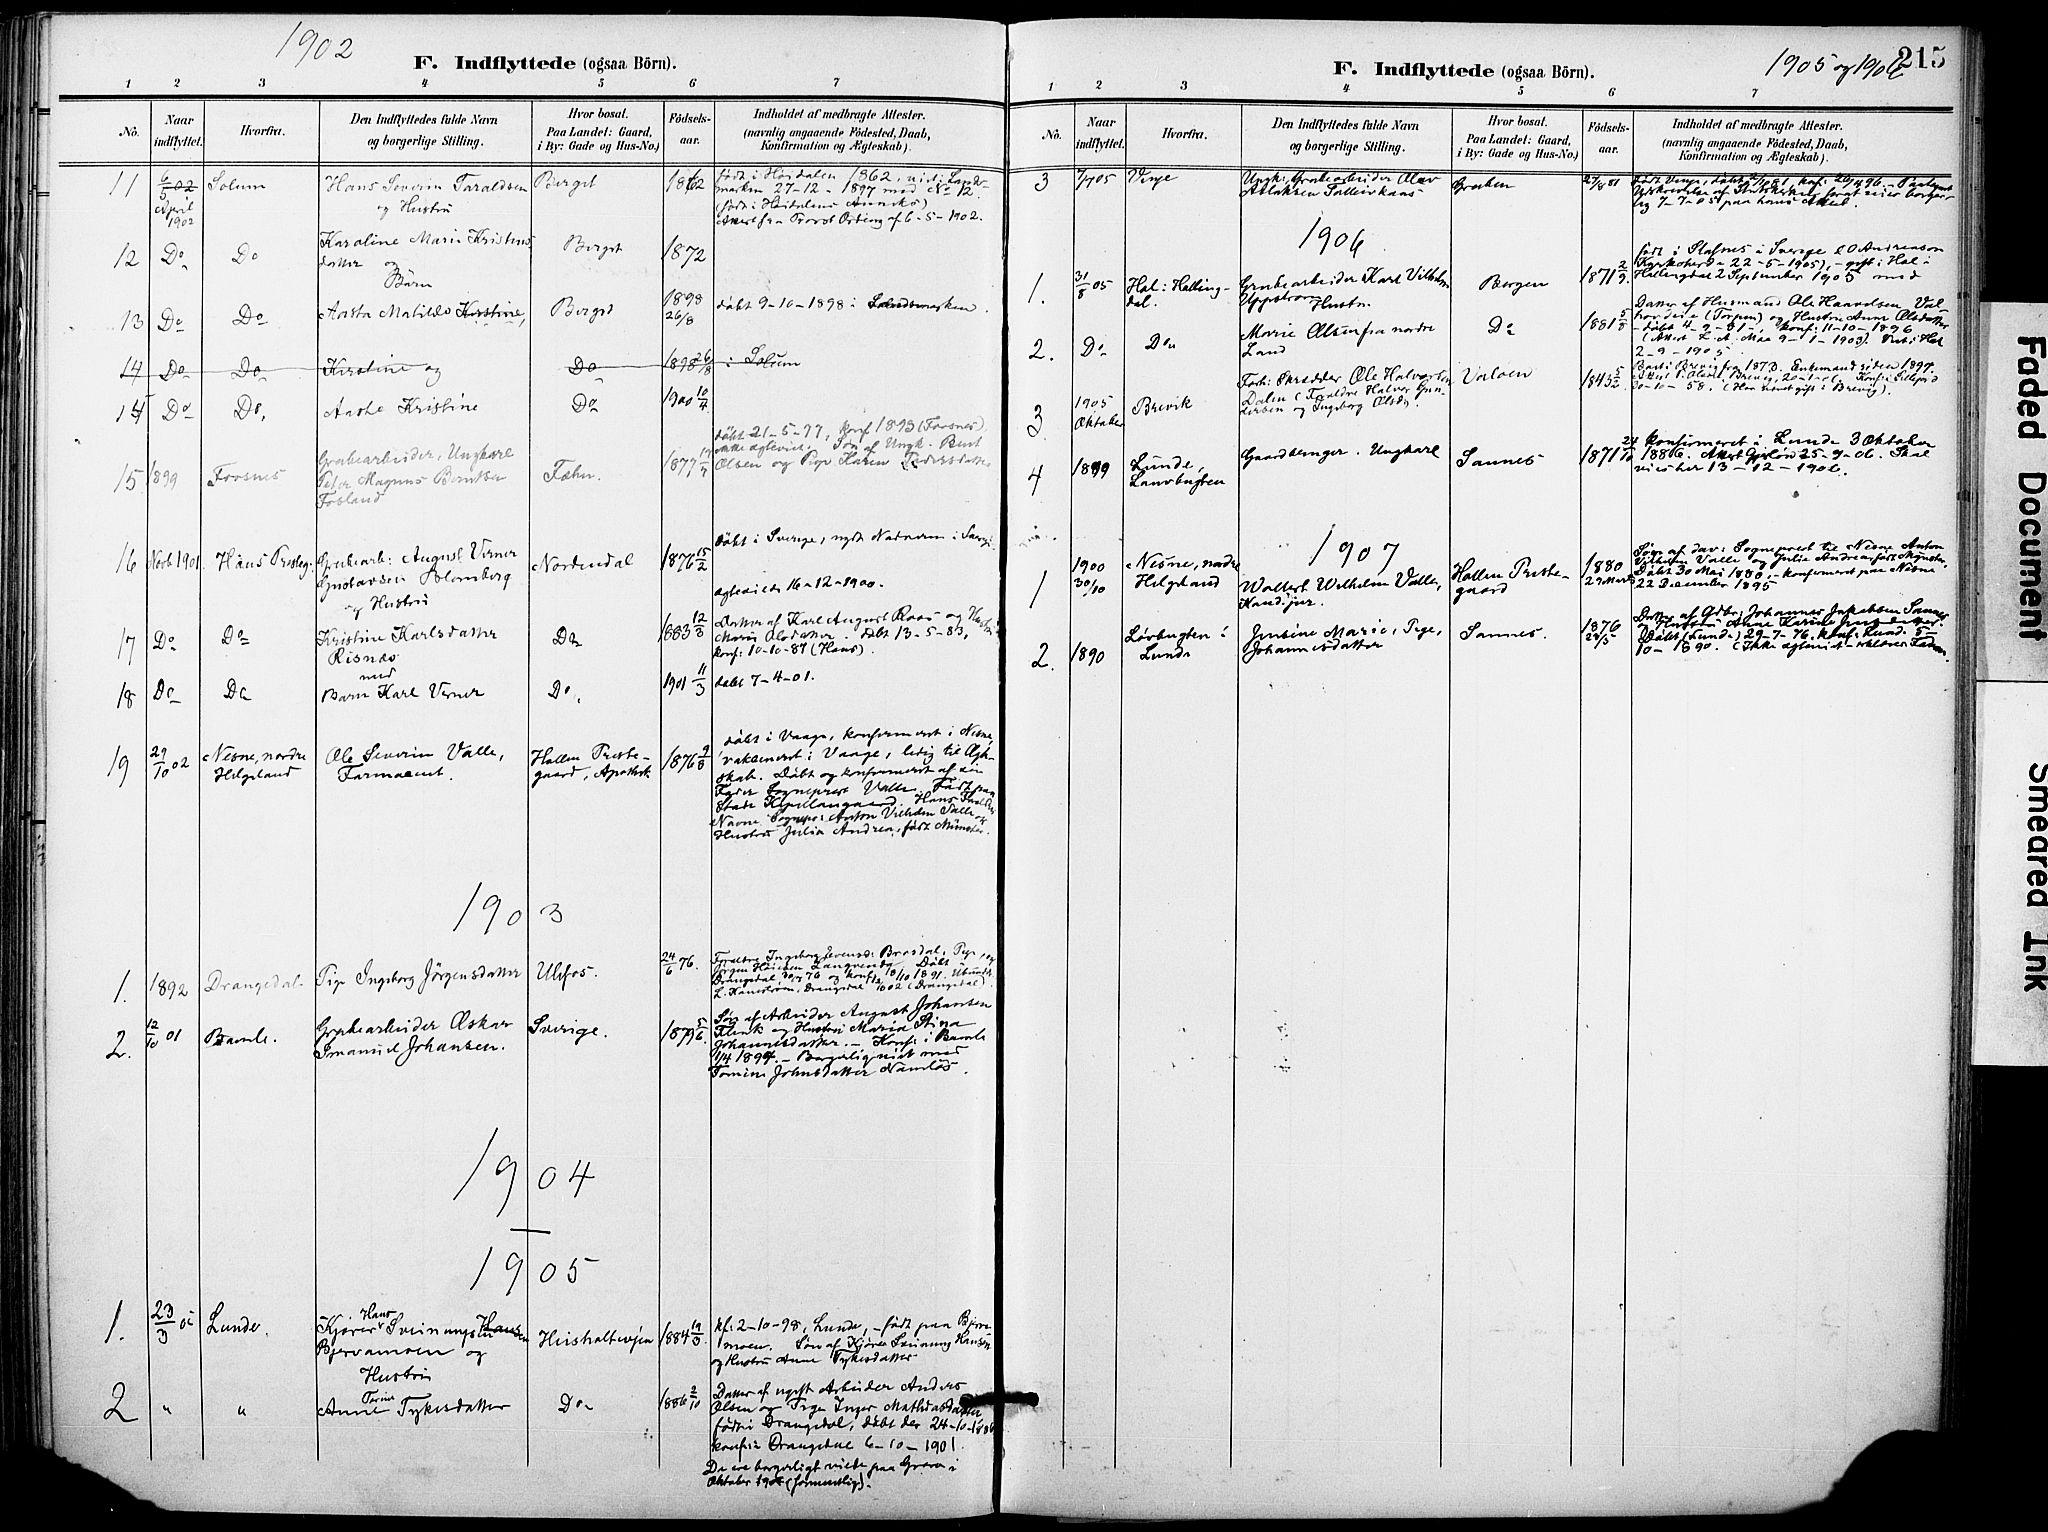 SAKO, Holla kirkebøker, F/Fa/L0010: Ministerialbok nr. 10, 1897-1907, s. 215